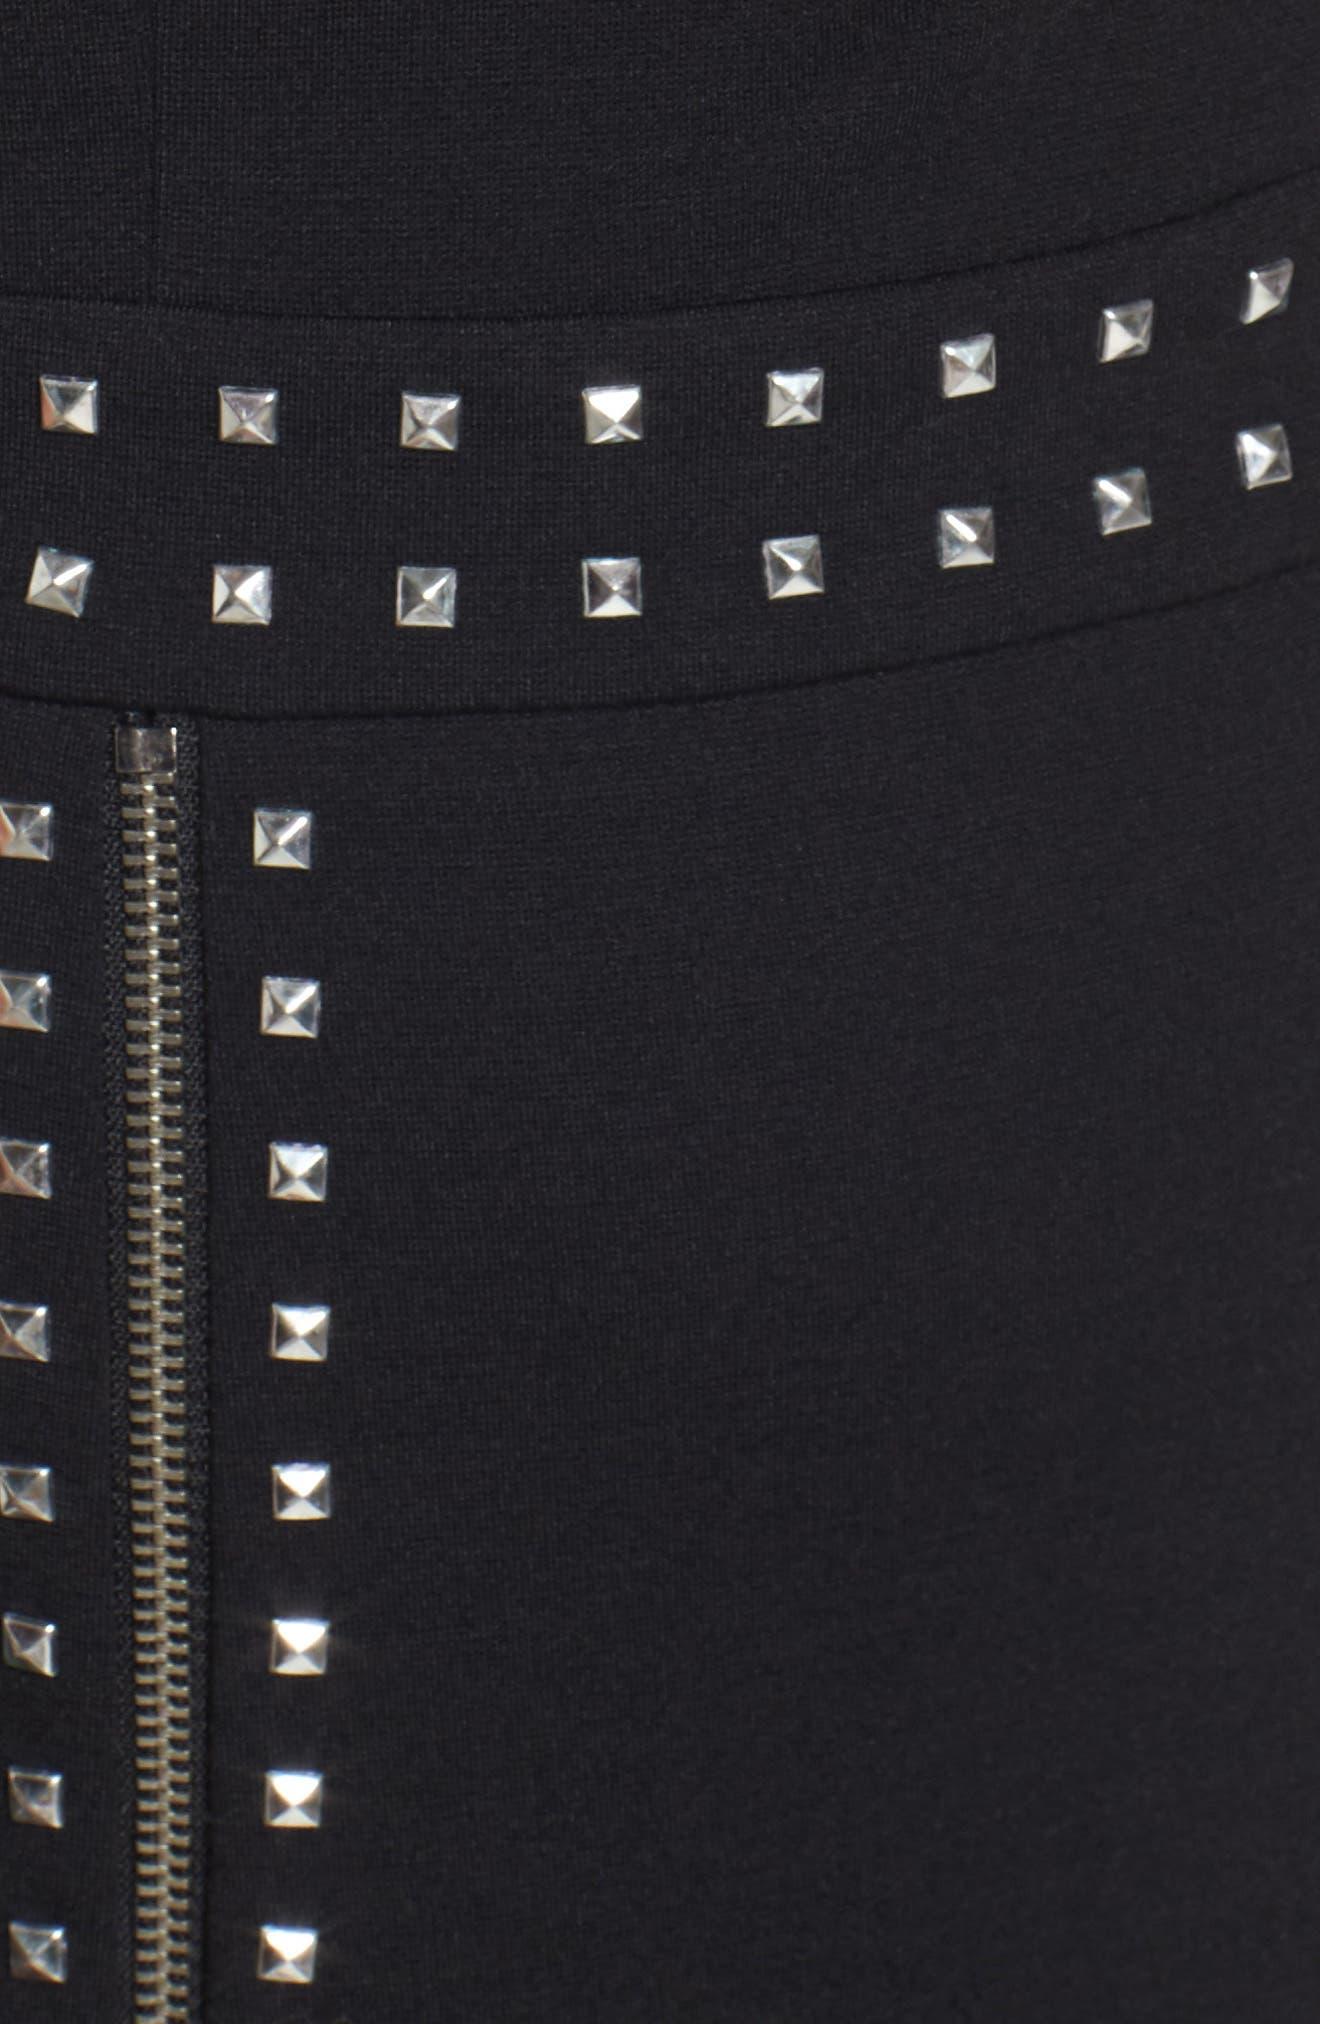 Pyramid Stud Zipper Detail Dress,                             Alternate thumbnail 5, color,                             001